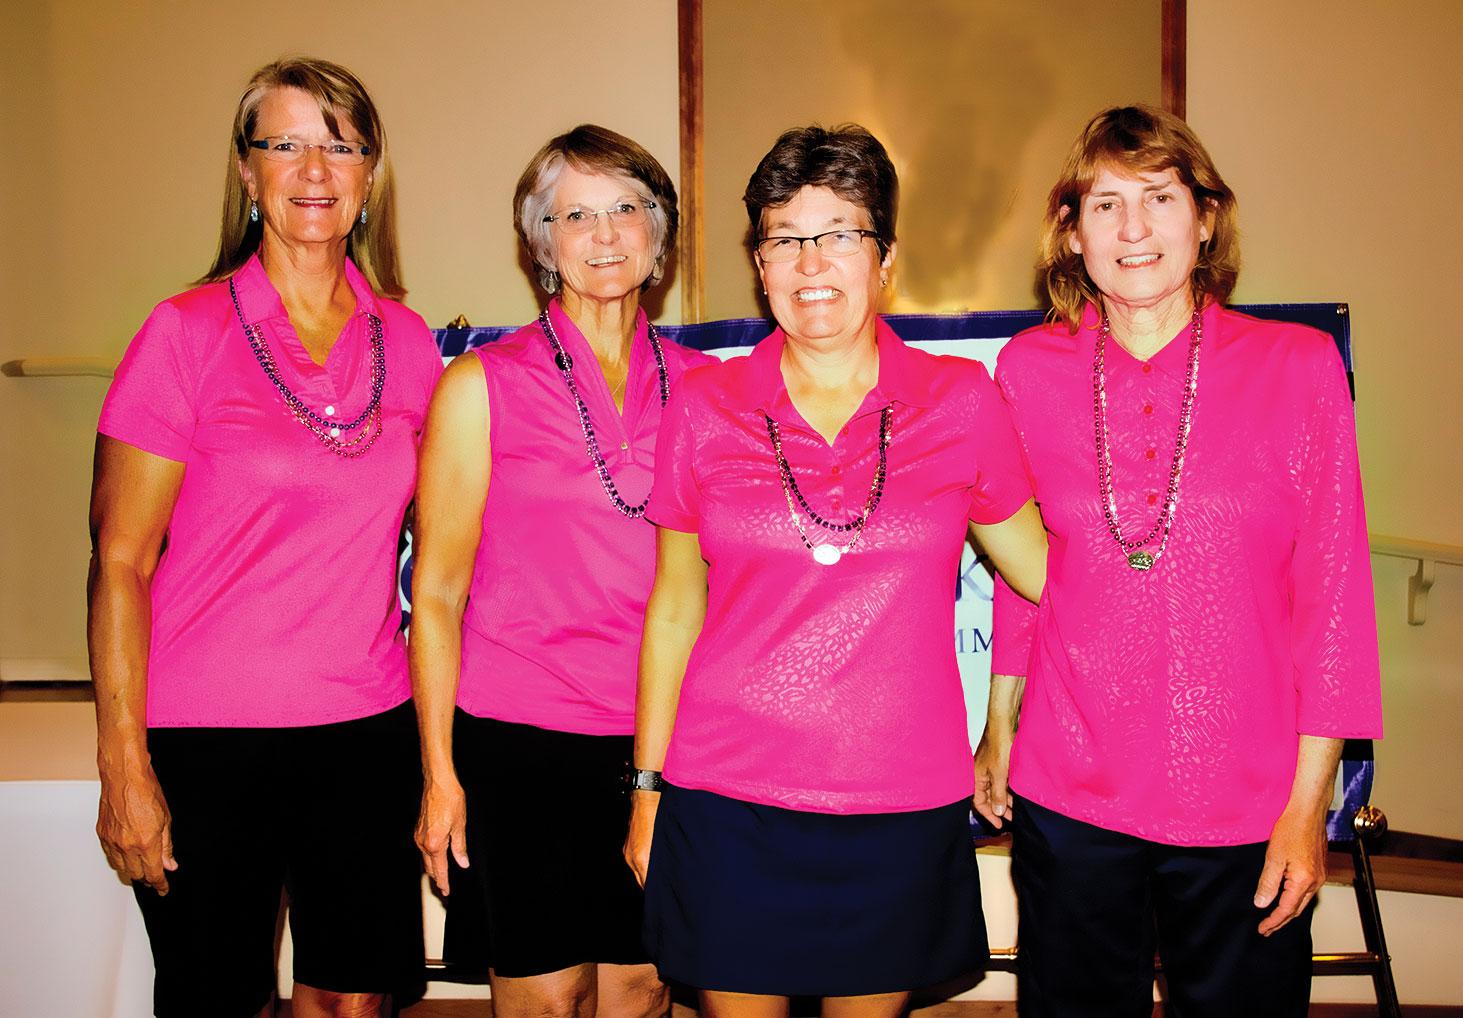 Top Hat Winners: Sandy Rowley, Karen Wilson, Ann Martin and Marcia Katz